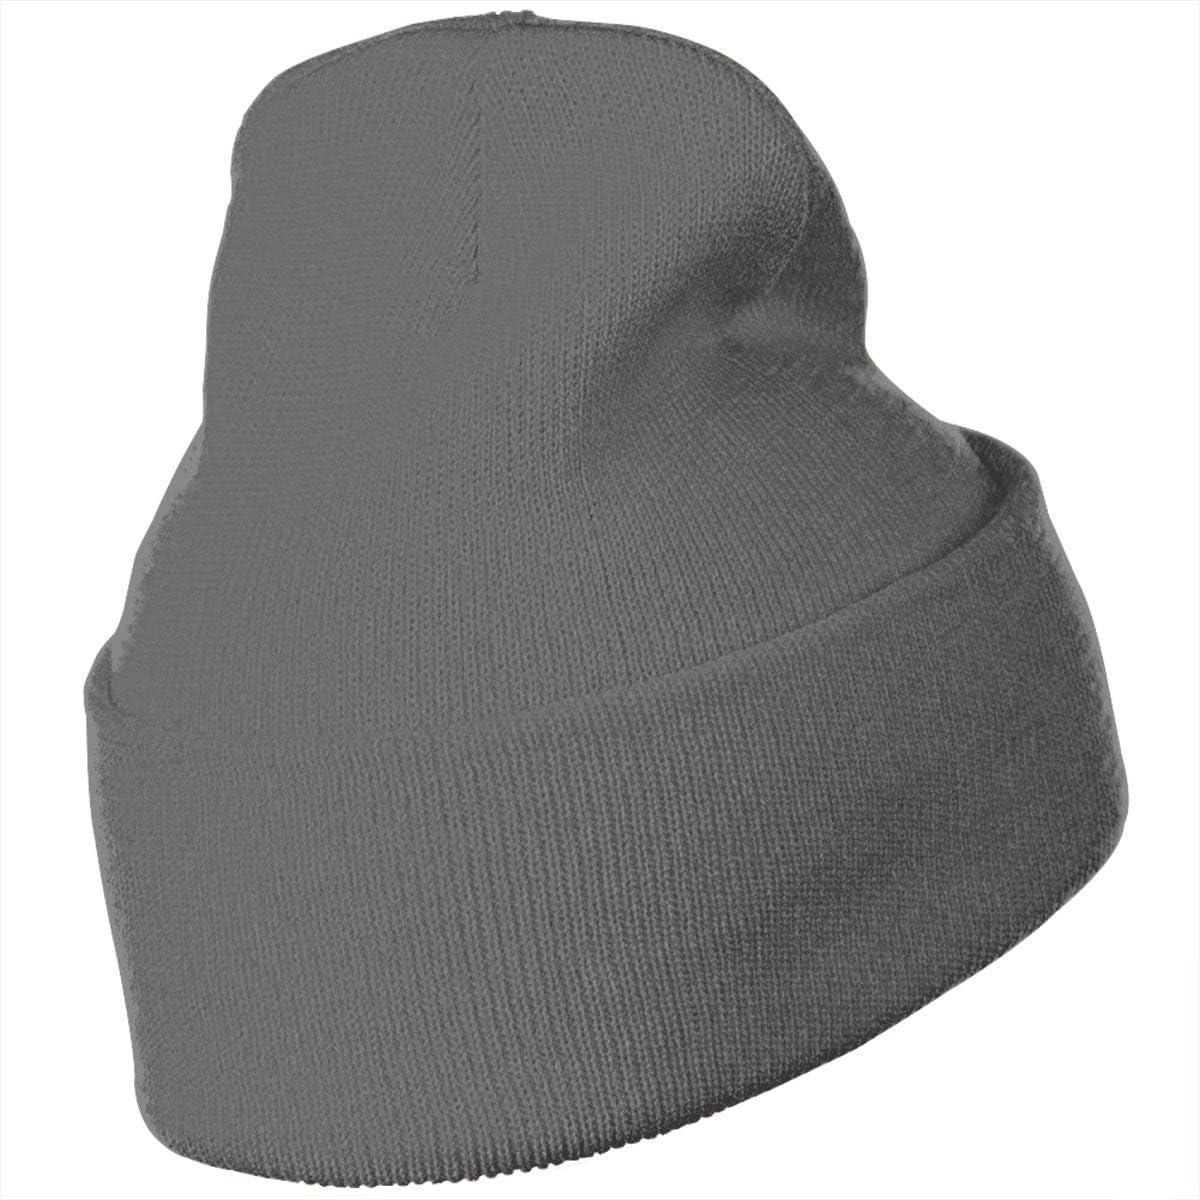 64546SF Canada Flag Men Women Beanies Stretchy /& Soft Knitting Skull Caps Unisex